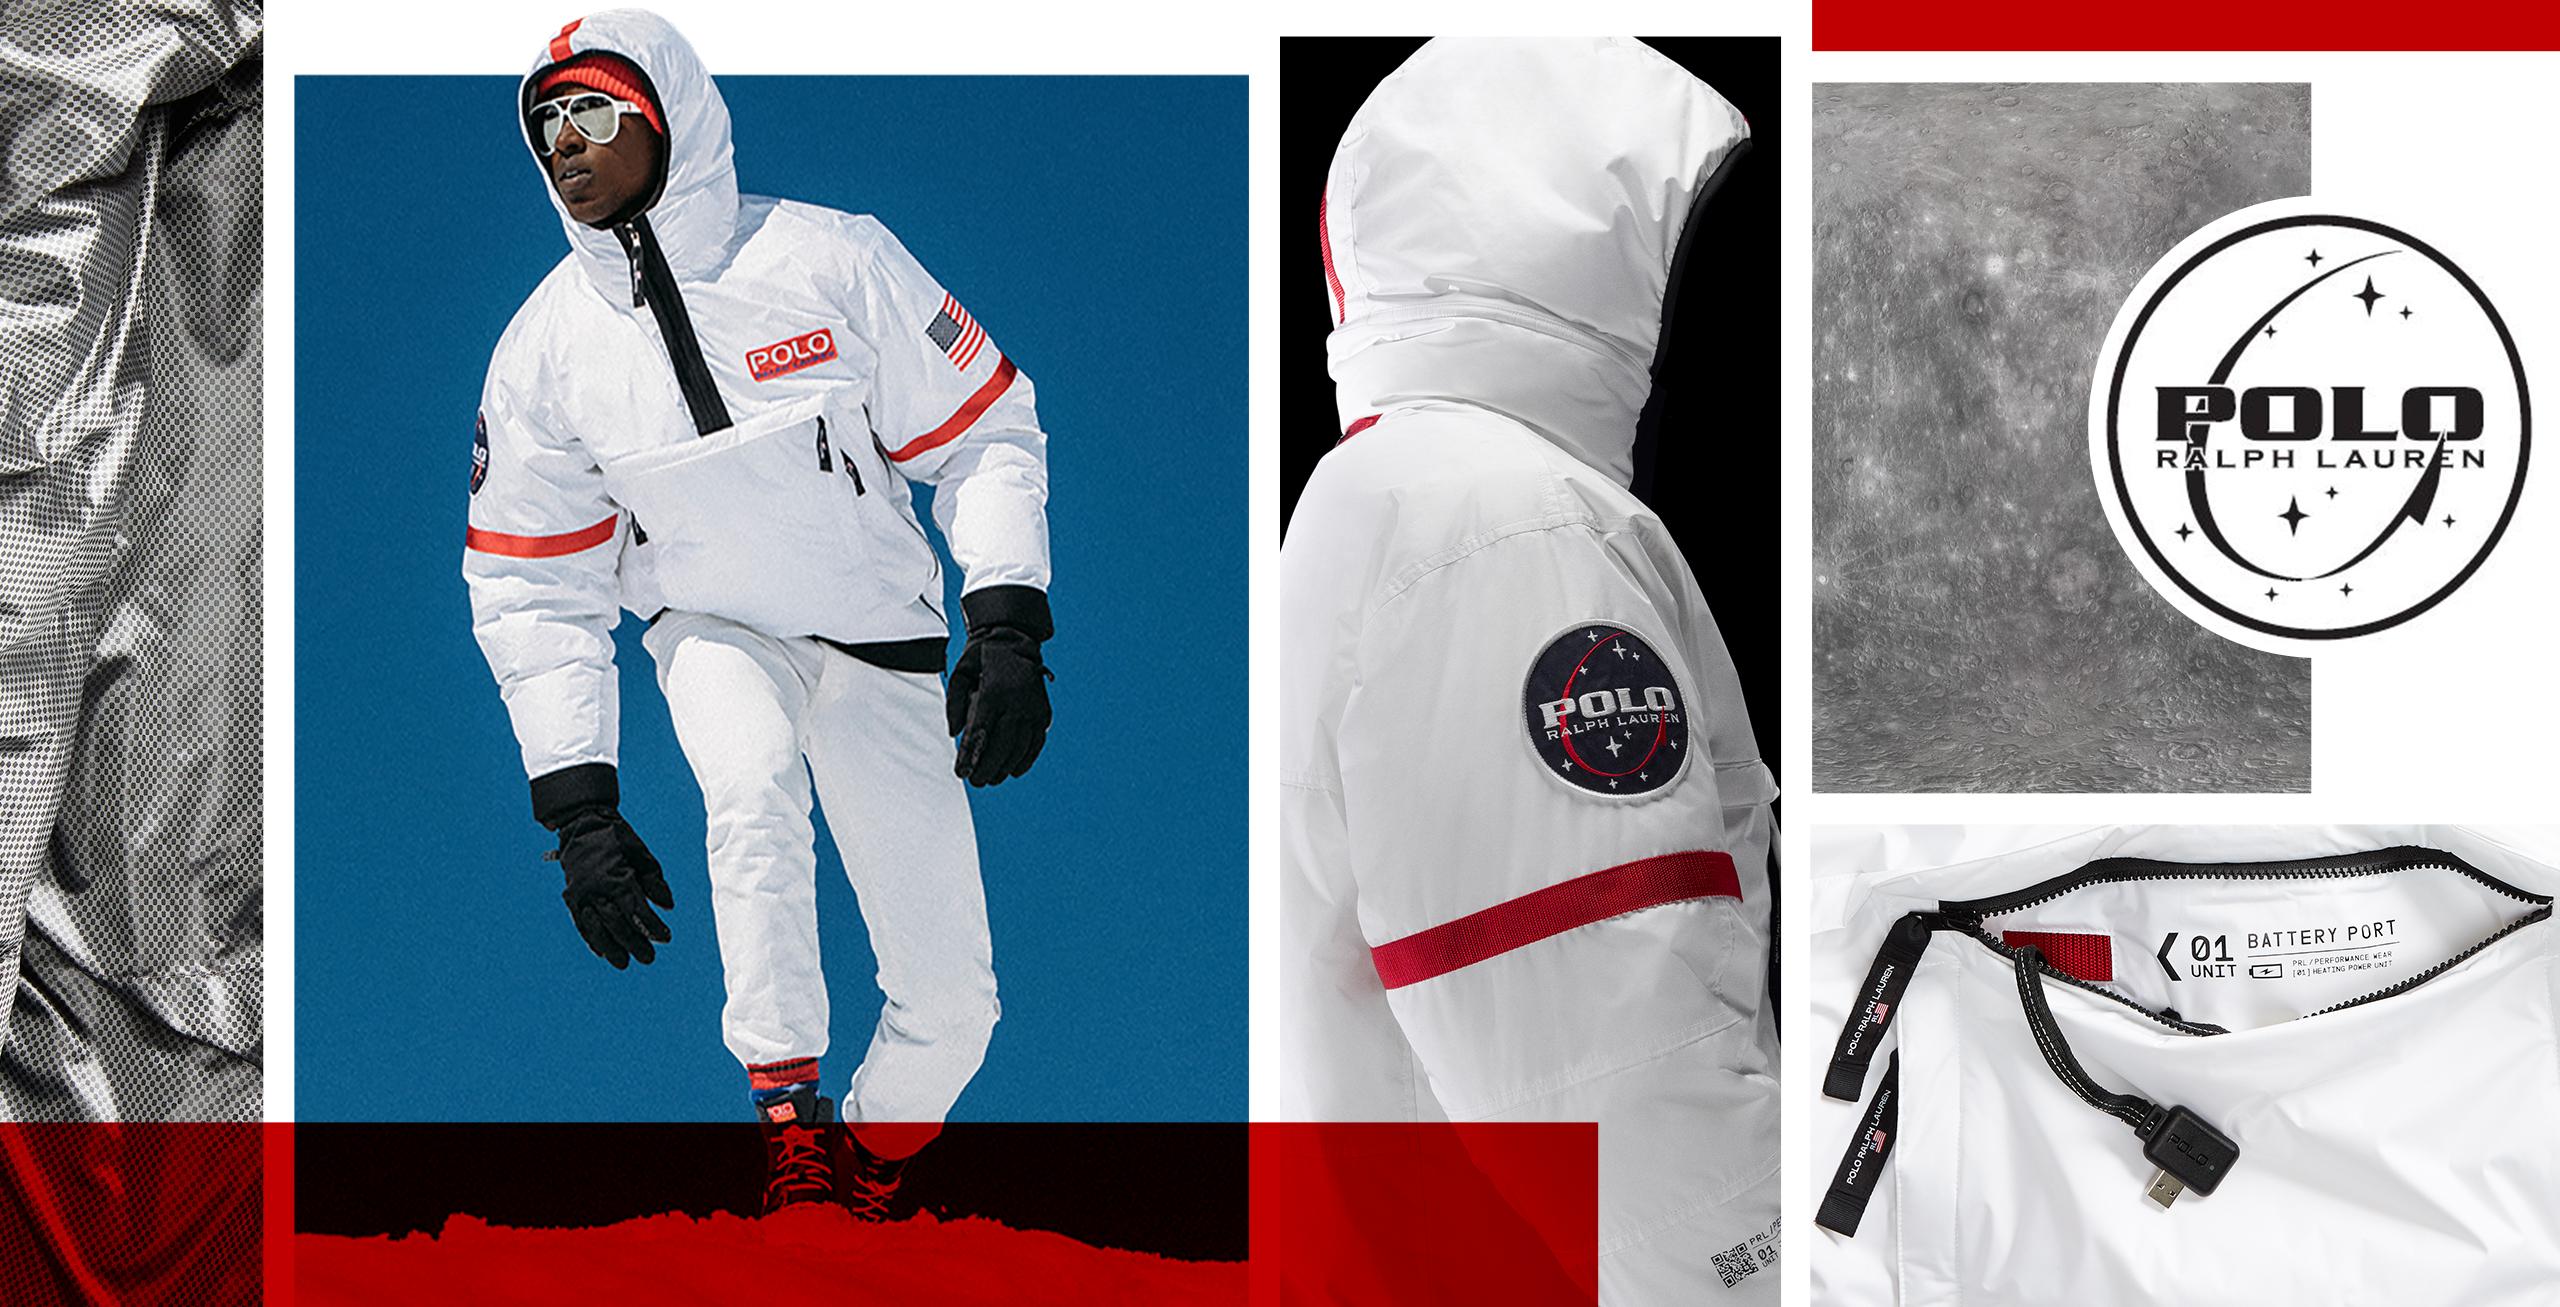 f2b42aae Details about New! Polo 11 Heated NASA ASTRONAUT puffer jacket Ralph Lauren  XL - NWT